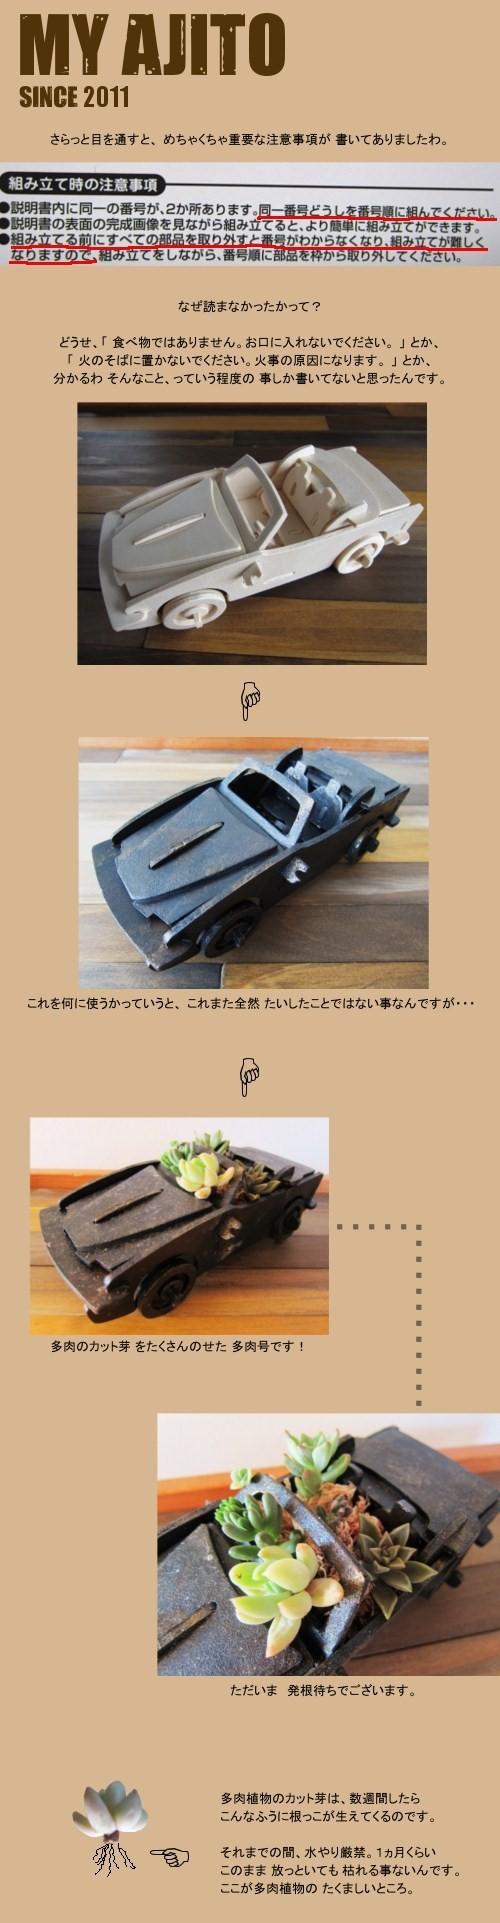 icar_04.jpg